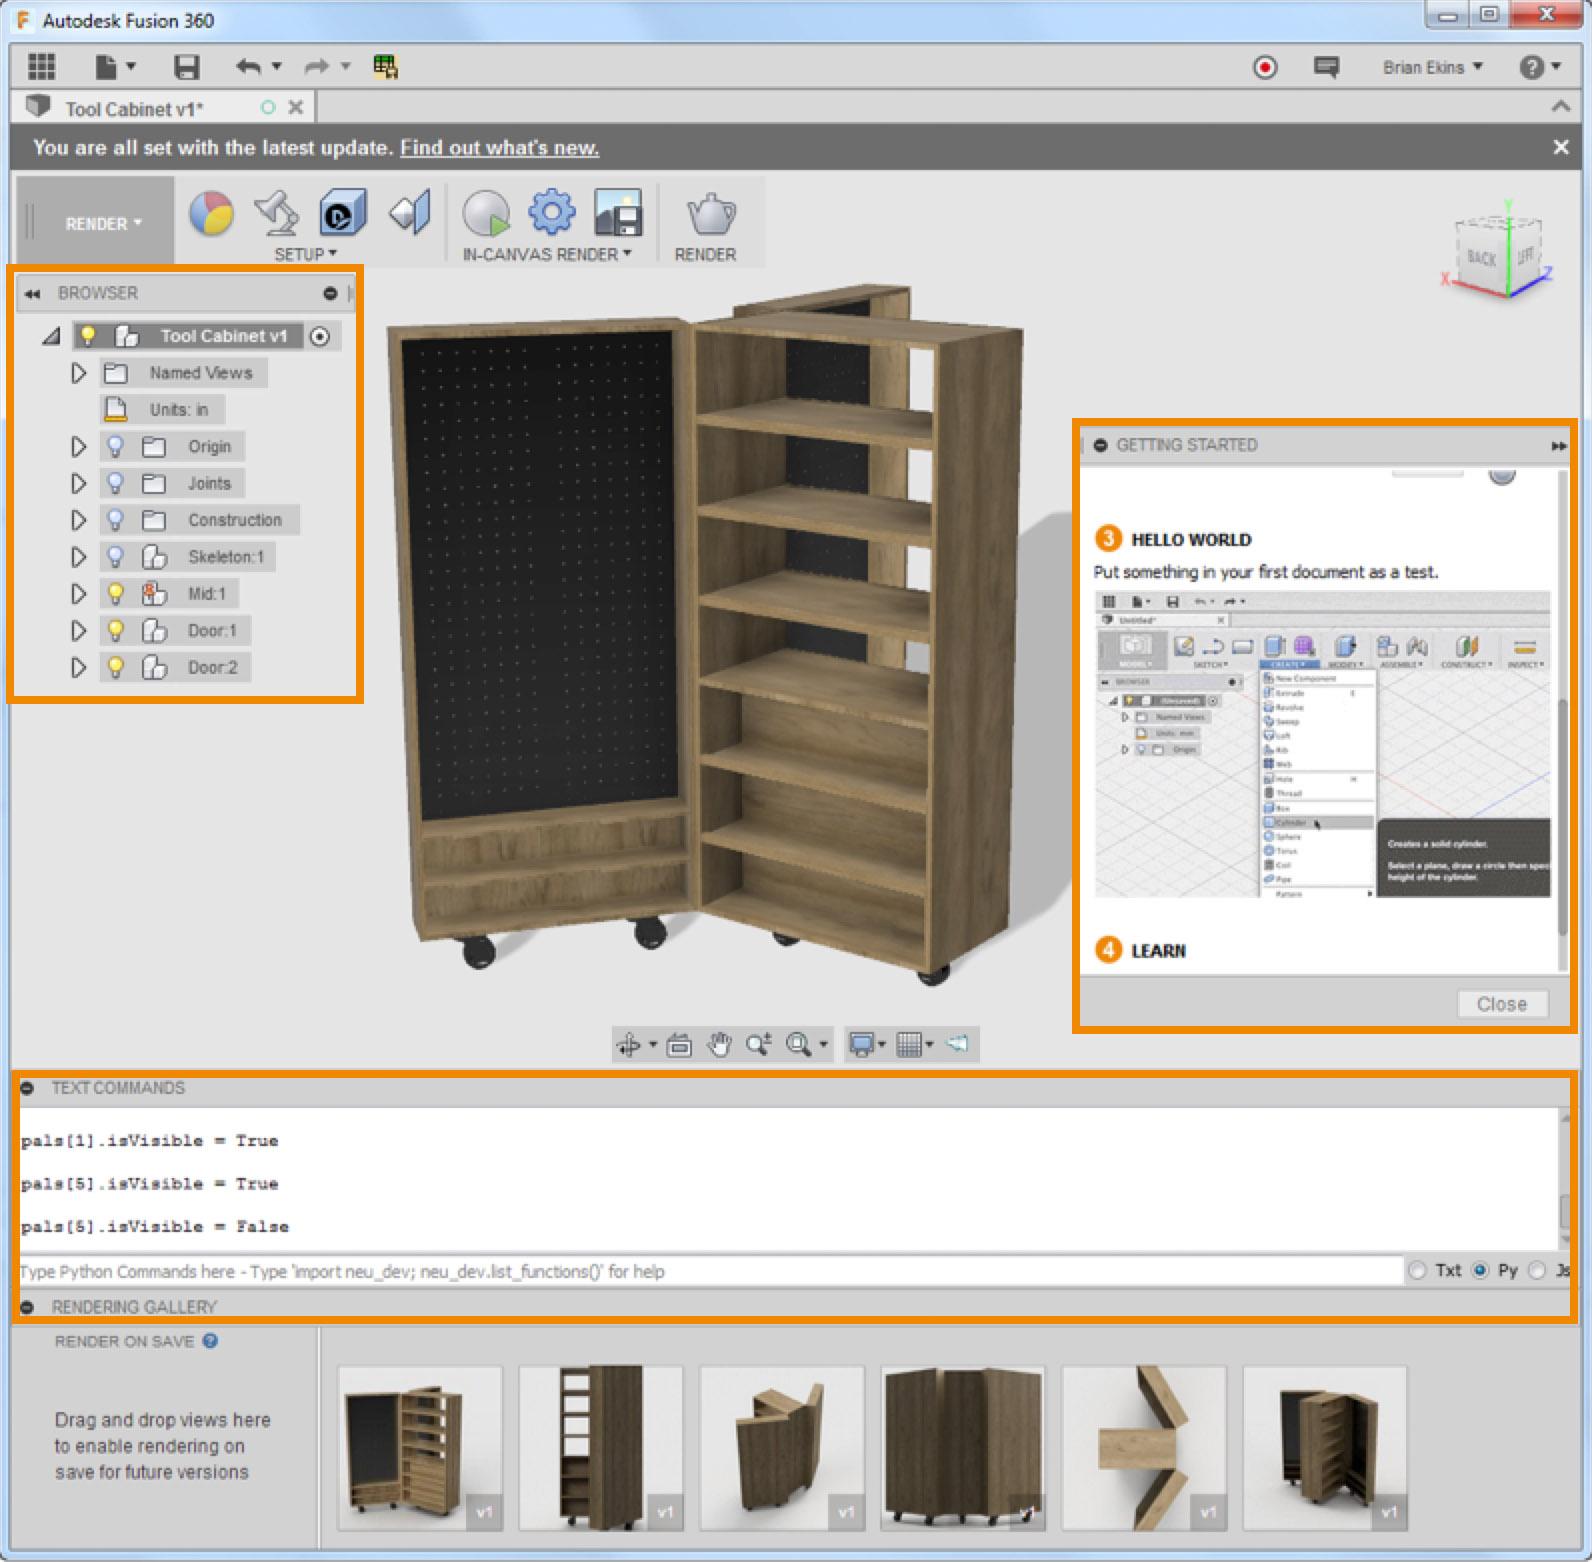 Autodesk Fusion 360 5